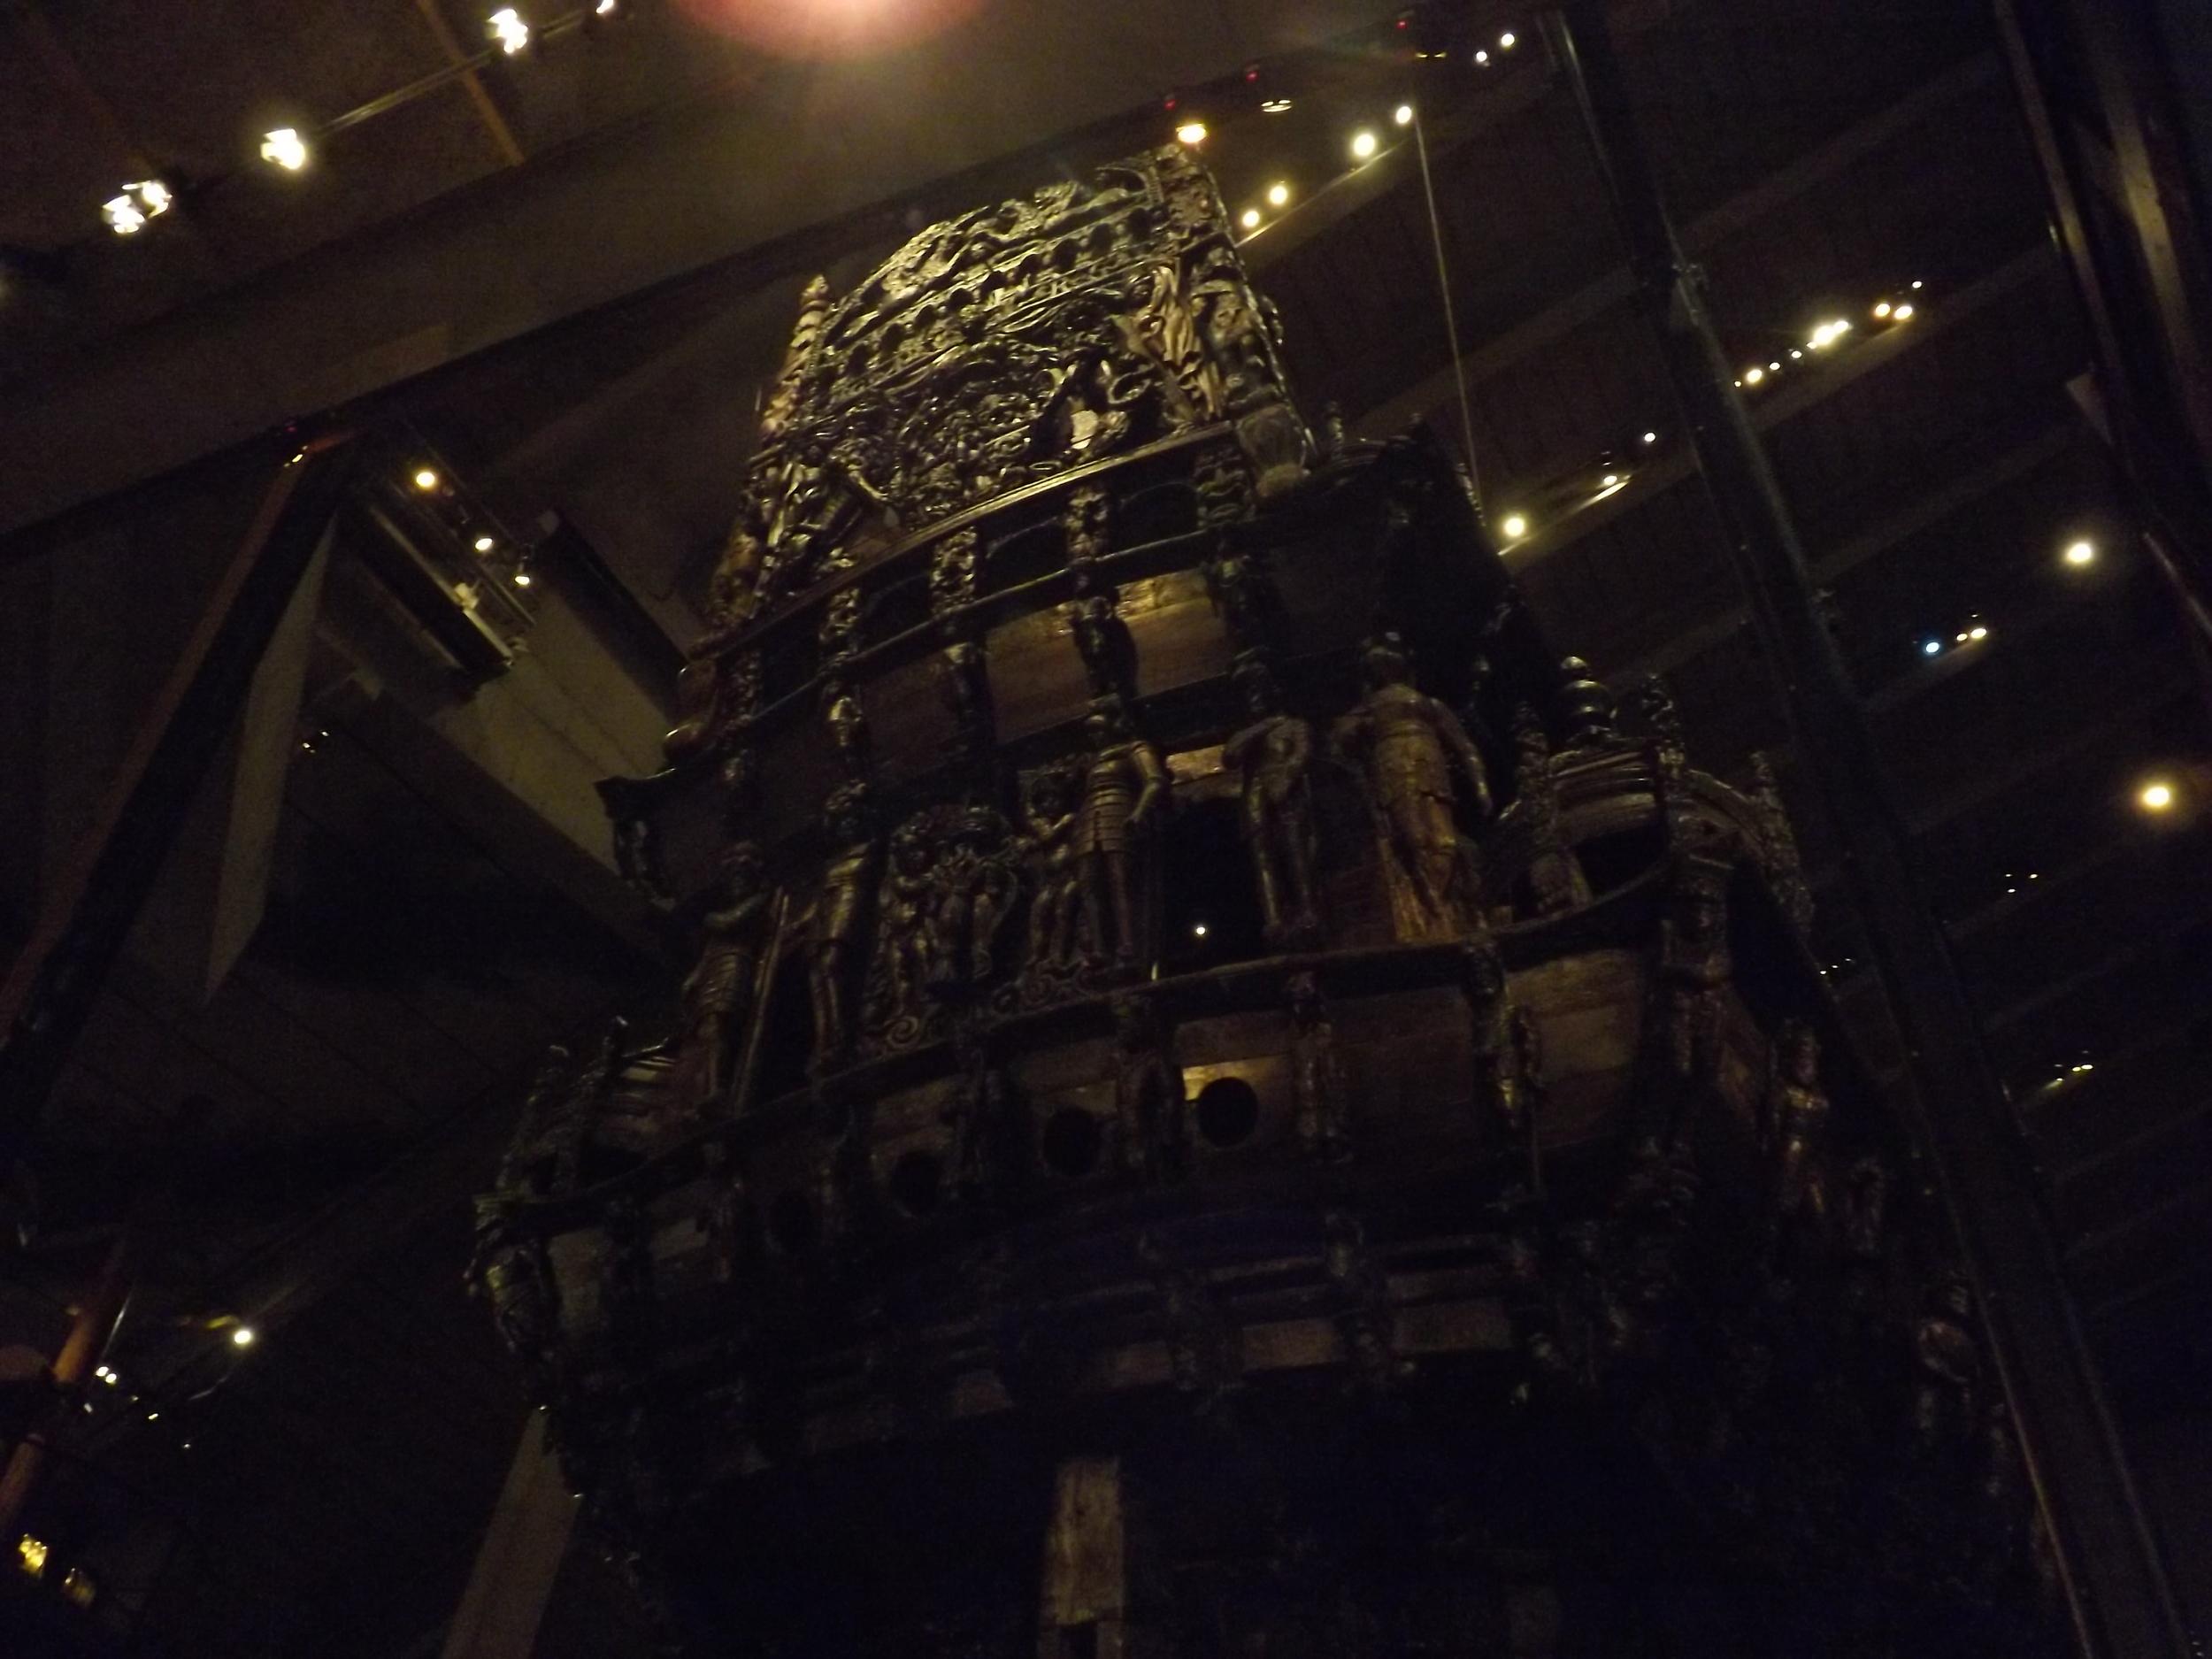 Top of Vasa Ship | Tall Girl Meets World